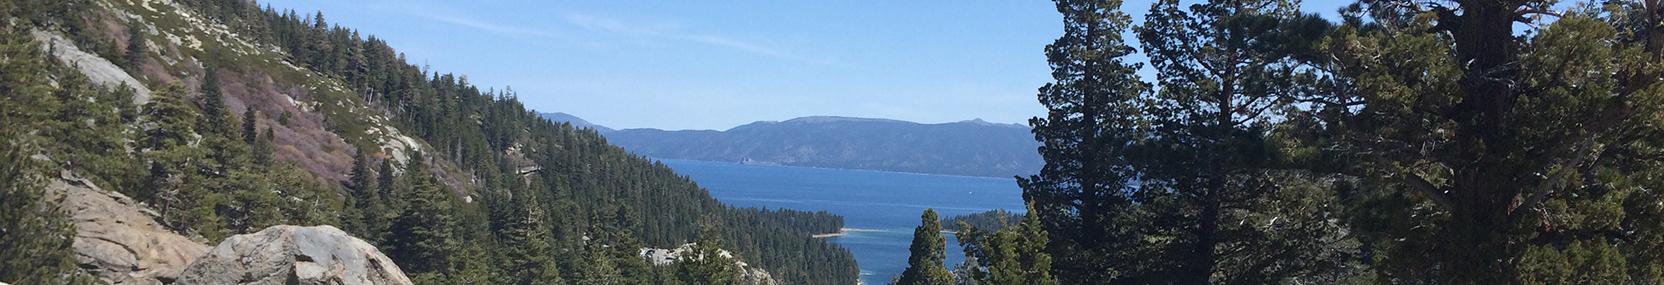 lake tahoe by carlin starrs